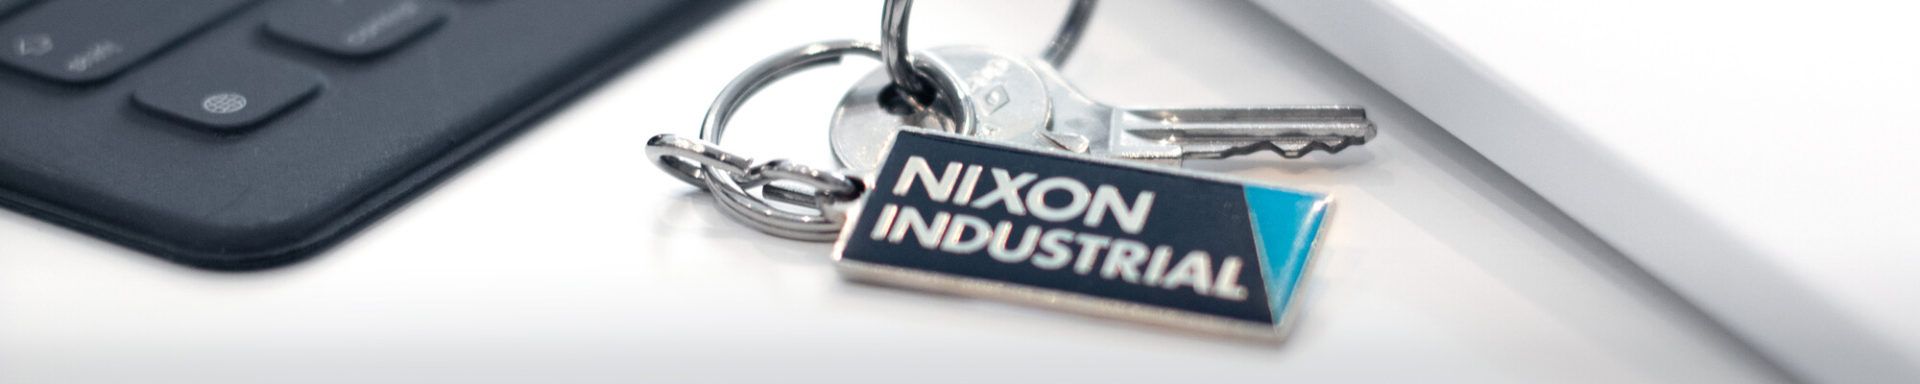 Nixon Industrial